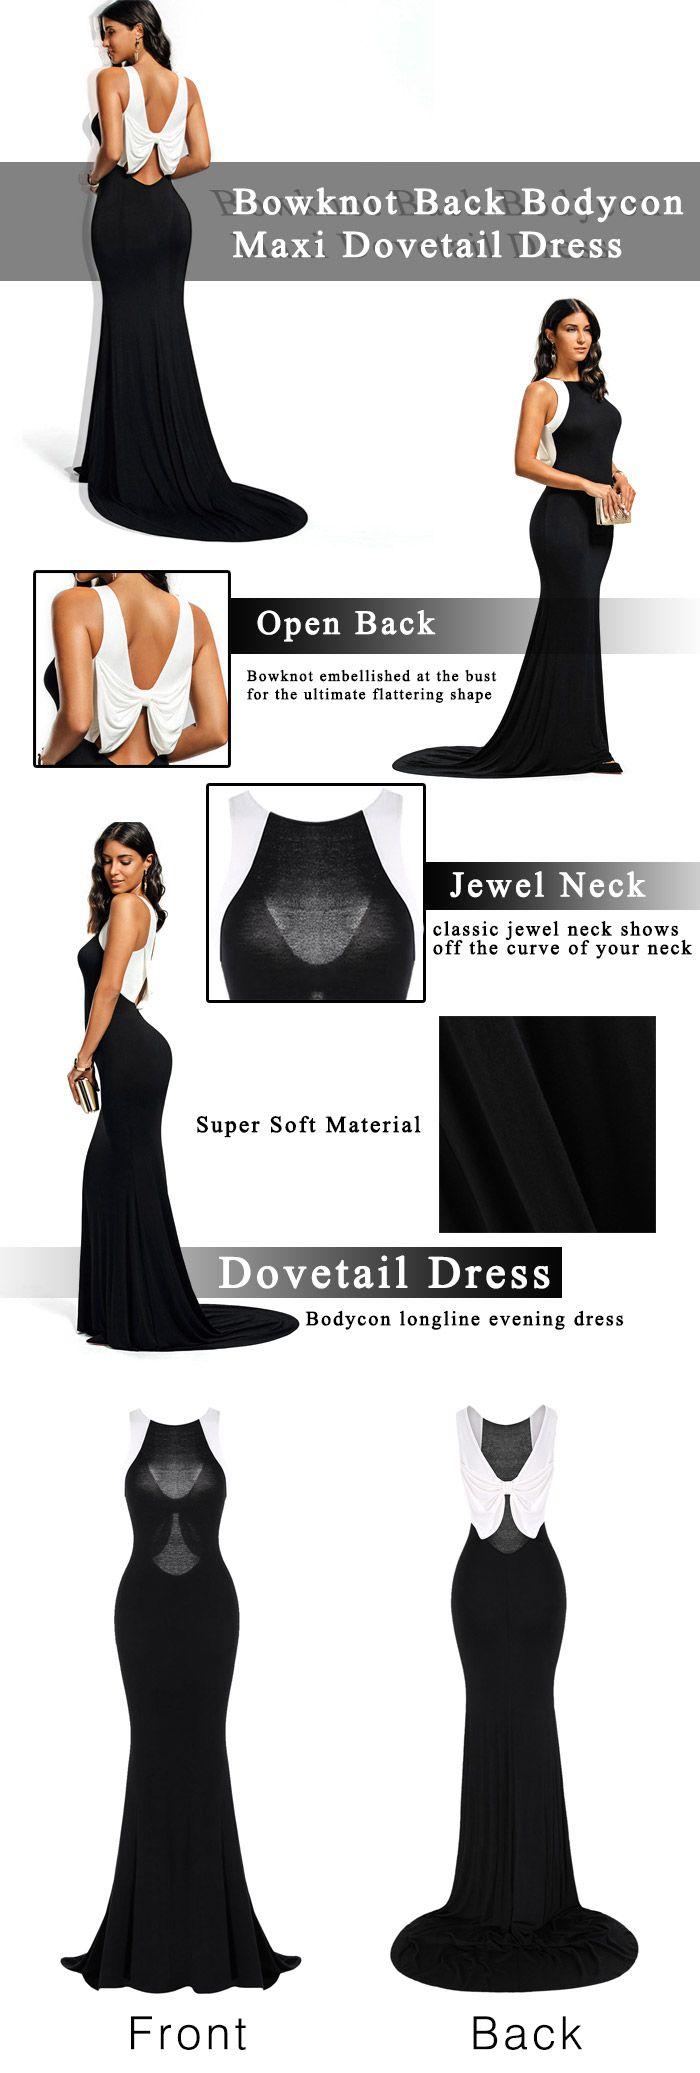 Bowknot Back Bodycon Maxi Dovetail Dress